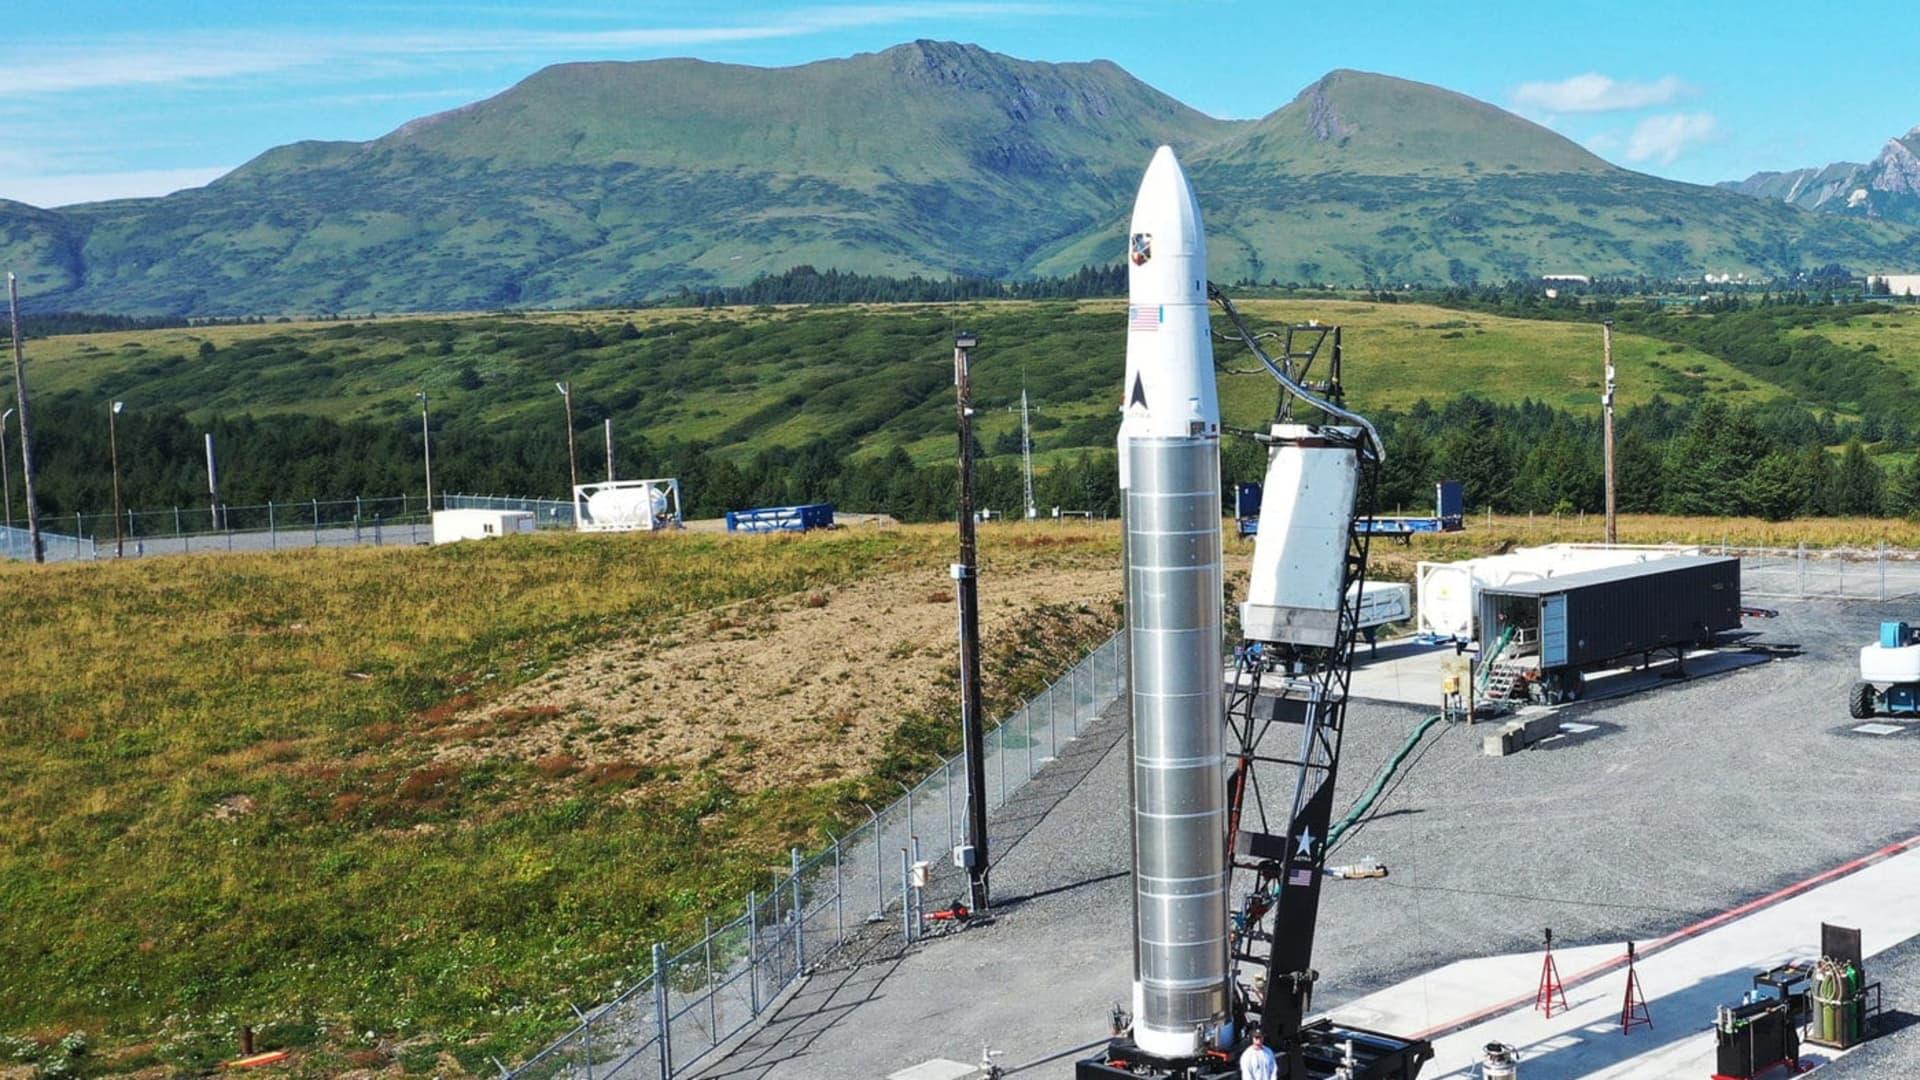 LV0006 on the launchpad in Kodiak, Alaska.